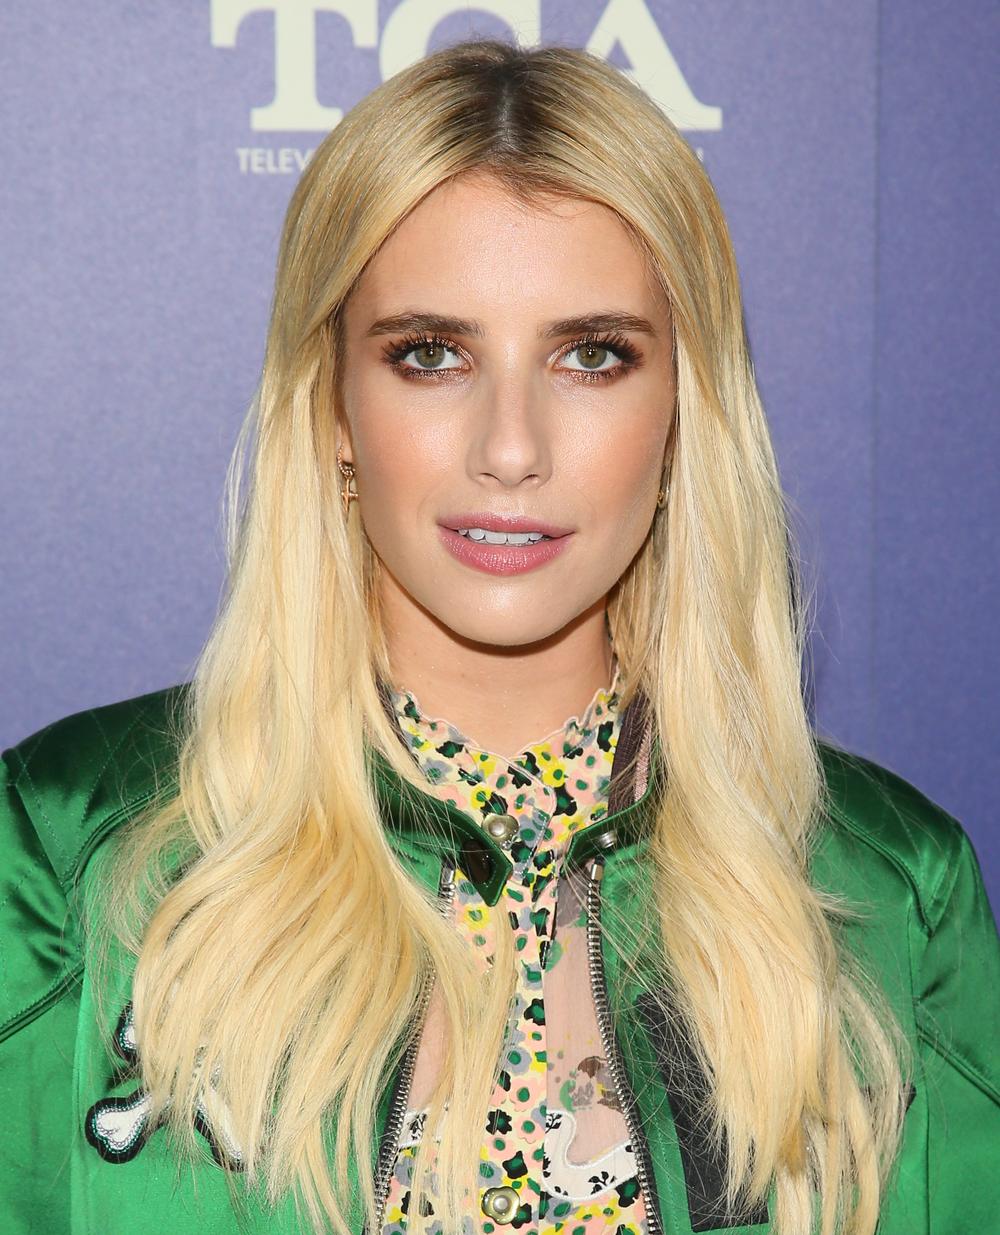 If you follow @ninezeroone, you've seen Emma Robert's hair makeovers more than a few times.